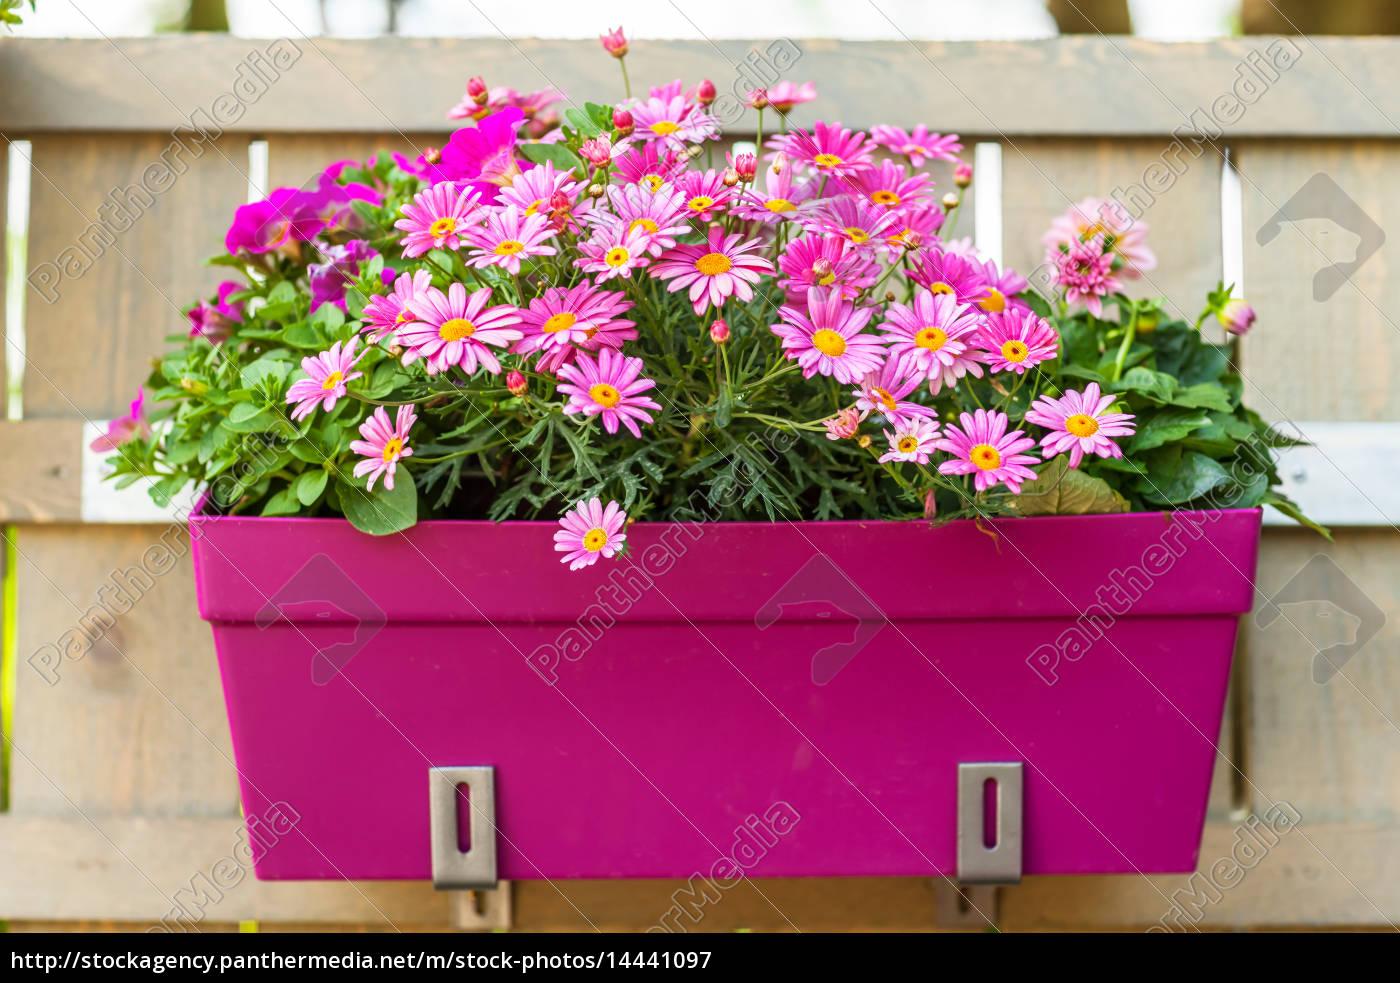 flower pot hanging on wooden fence - 14441097 ...  sc 1 st  PantherMedia & Flower pot hanging on wooden fence - Royalty free image - #14441097 ...